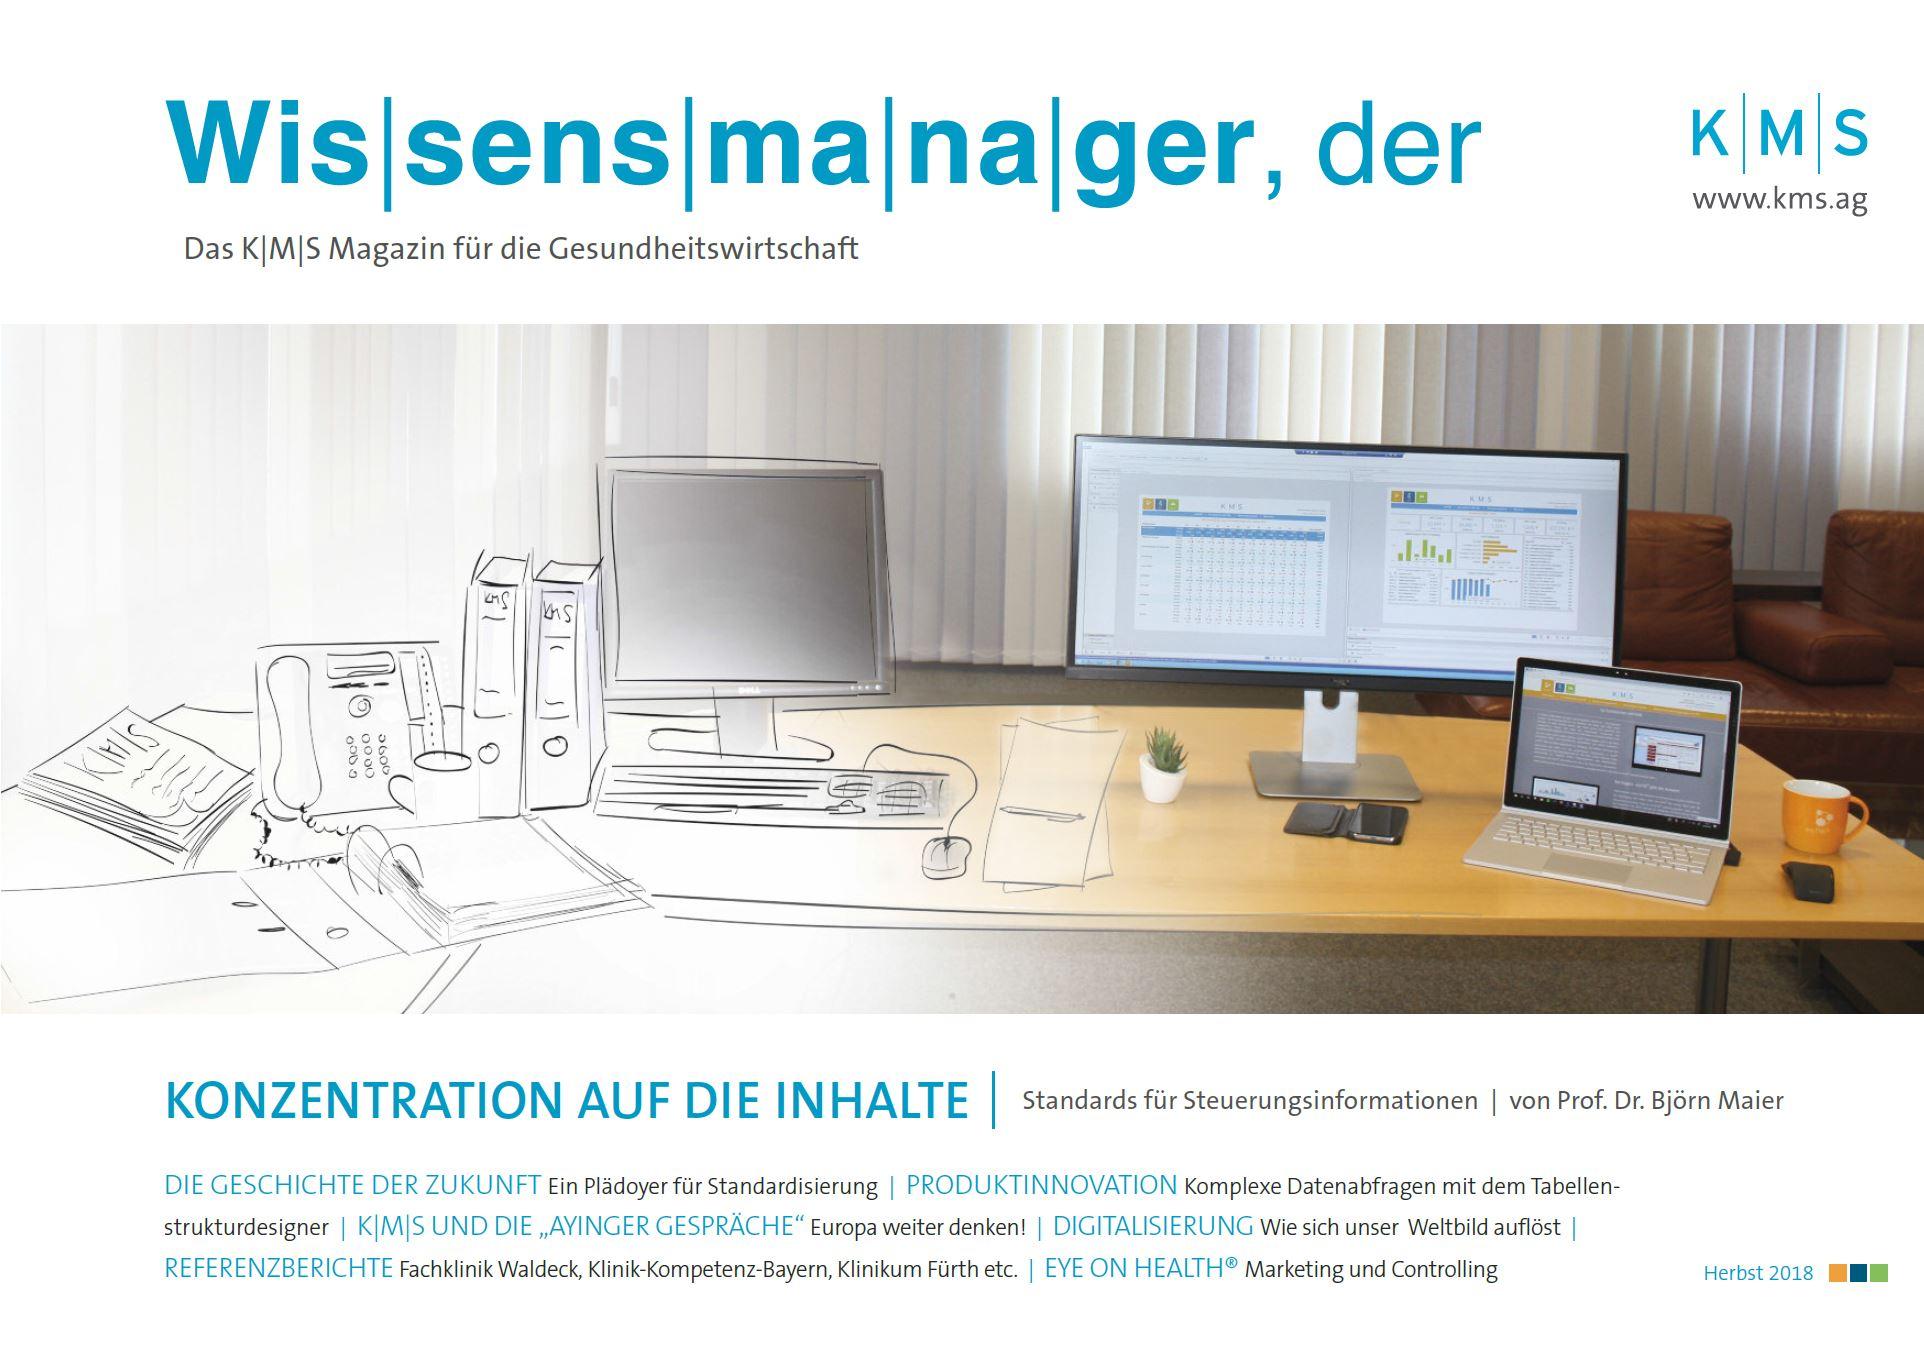 DerWissensmanager-Herbst2018-Cover.JPG